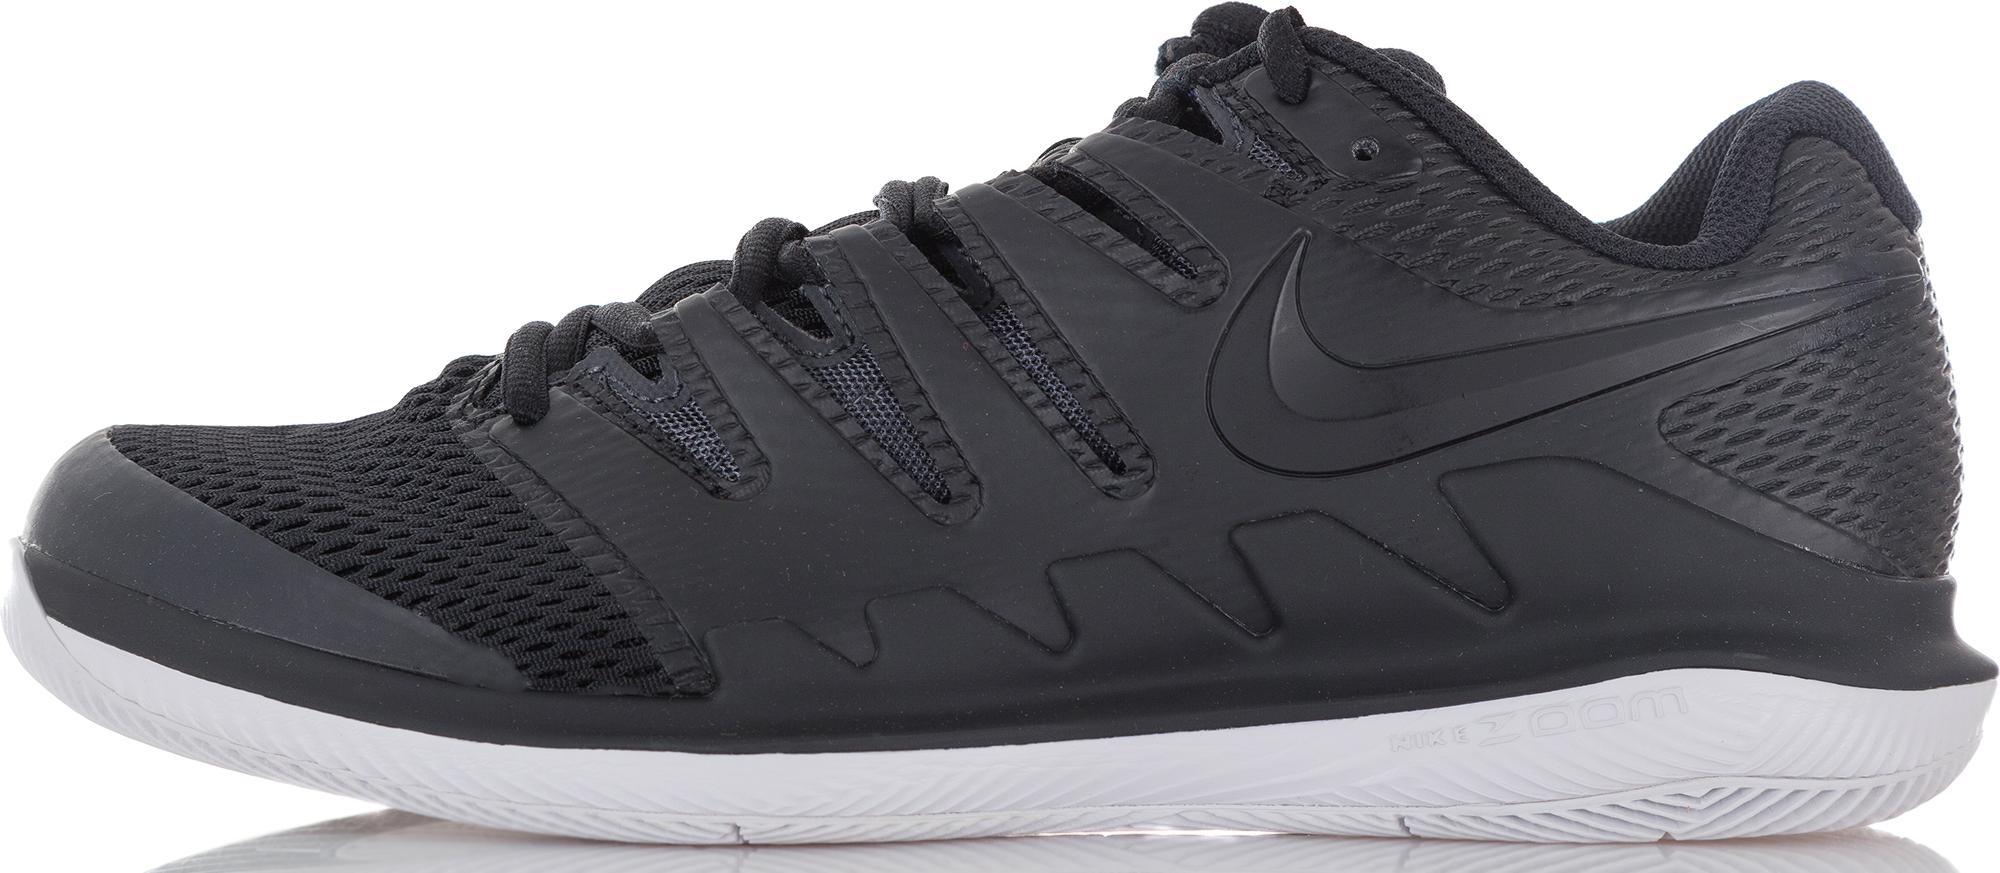 Nike Кроссовки для мальчиков Nike Air Zoom Vapor X Hc